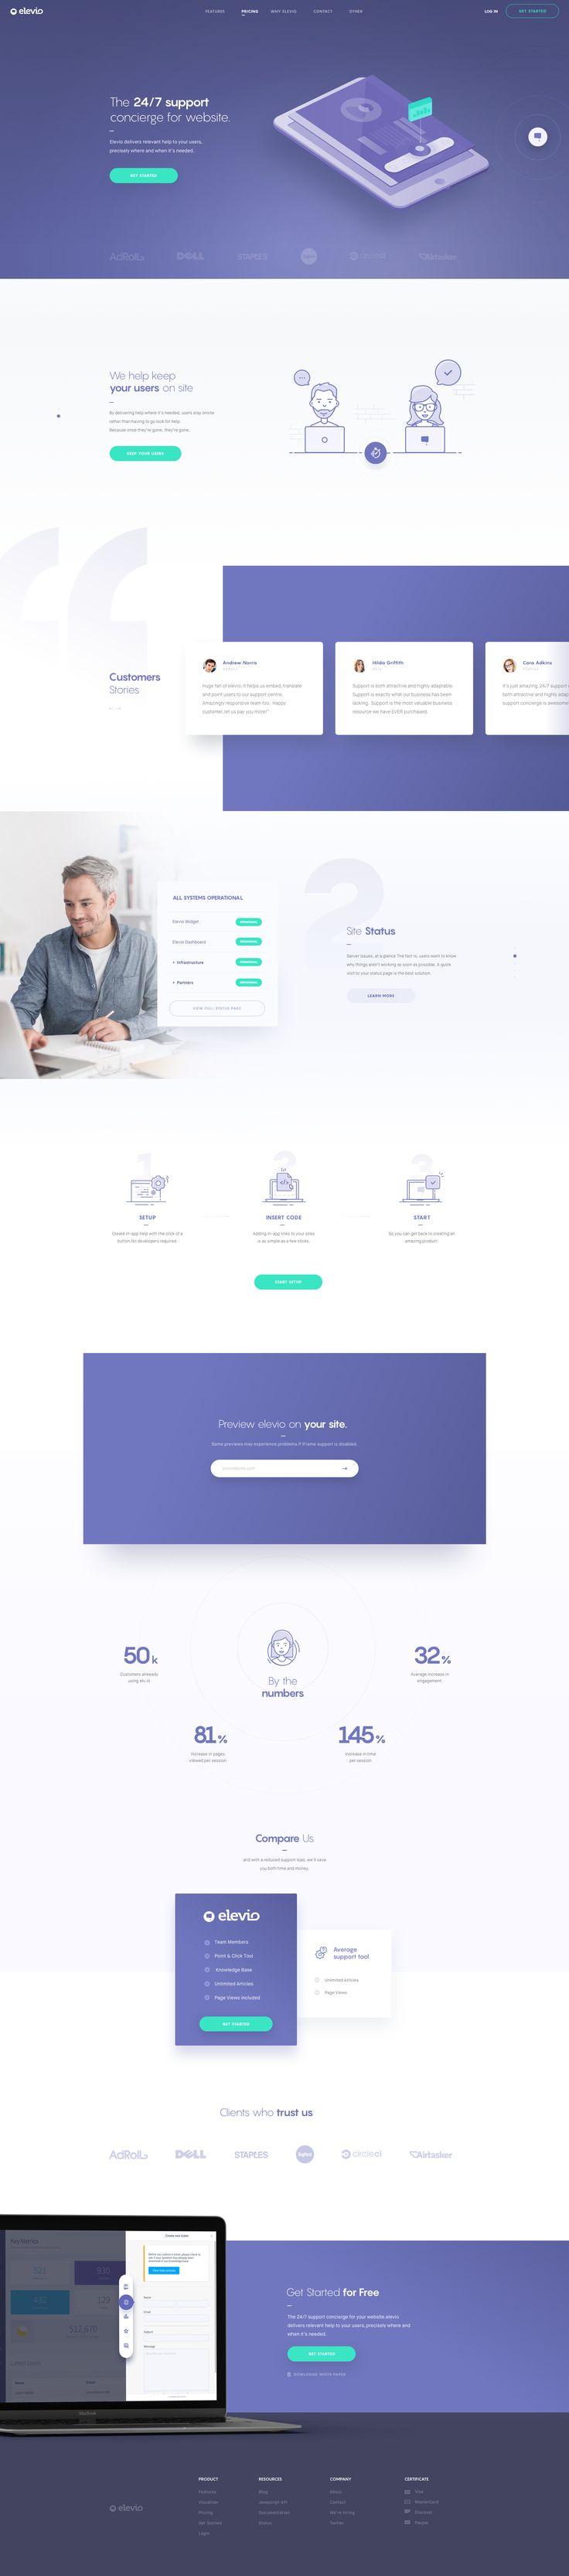 Elev.Io Landing Page